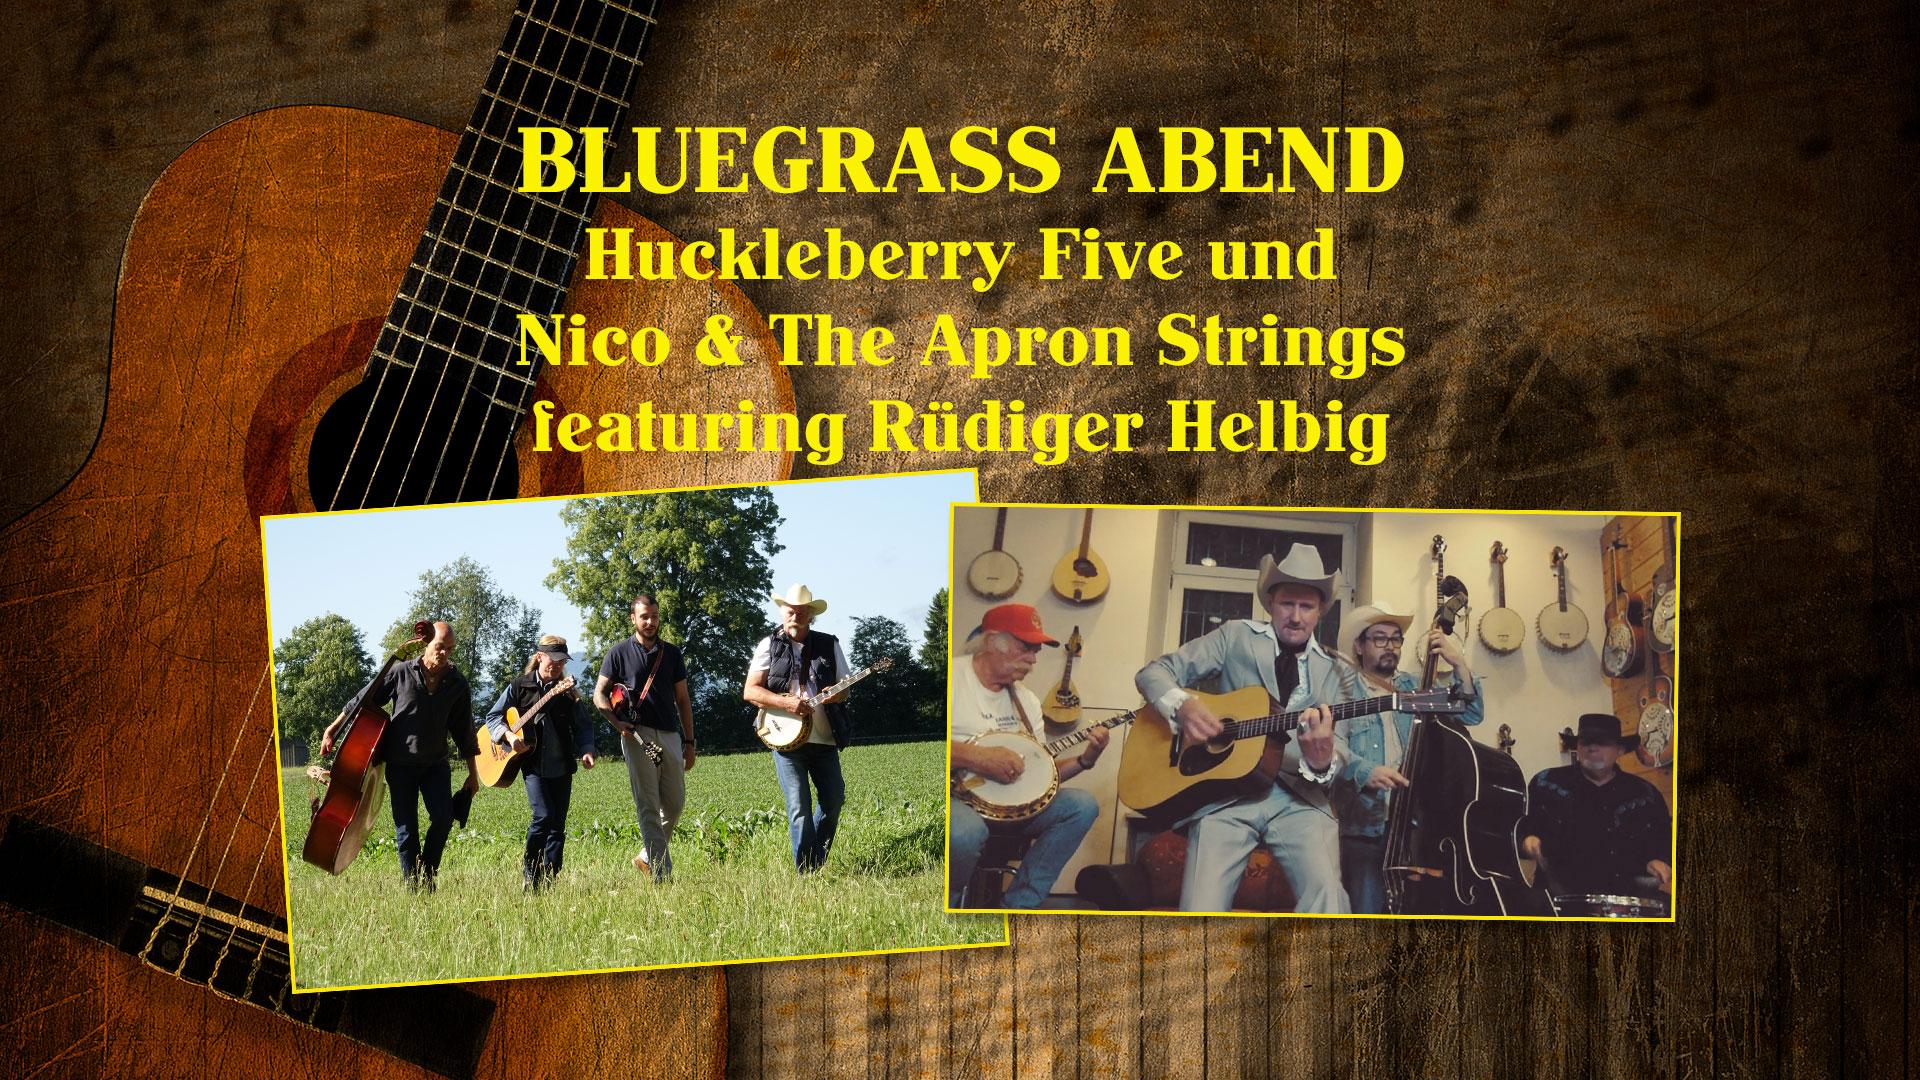 Huckleberry Five und Nico & The Apron Strings